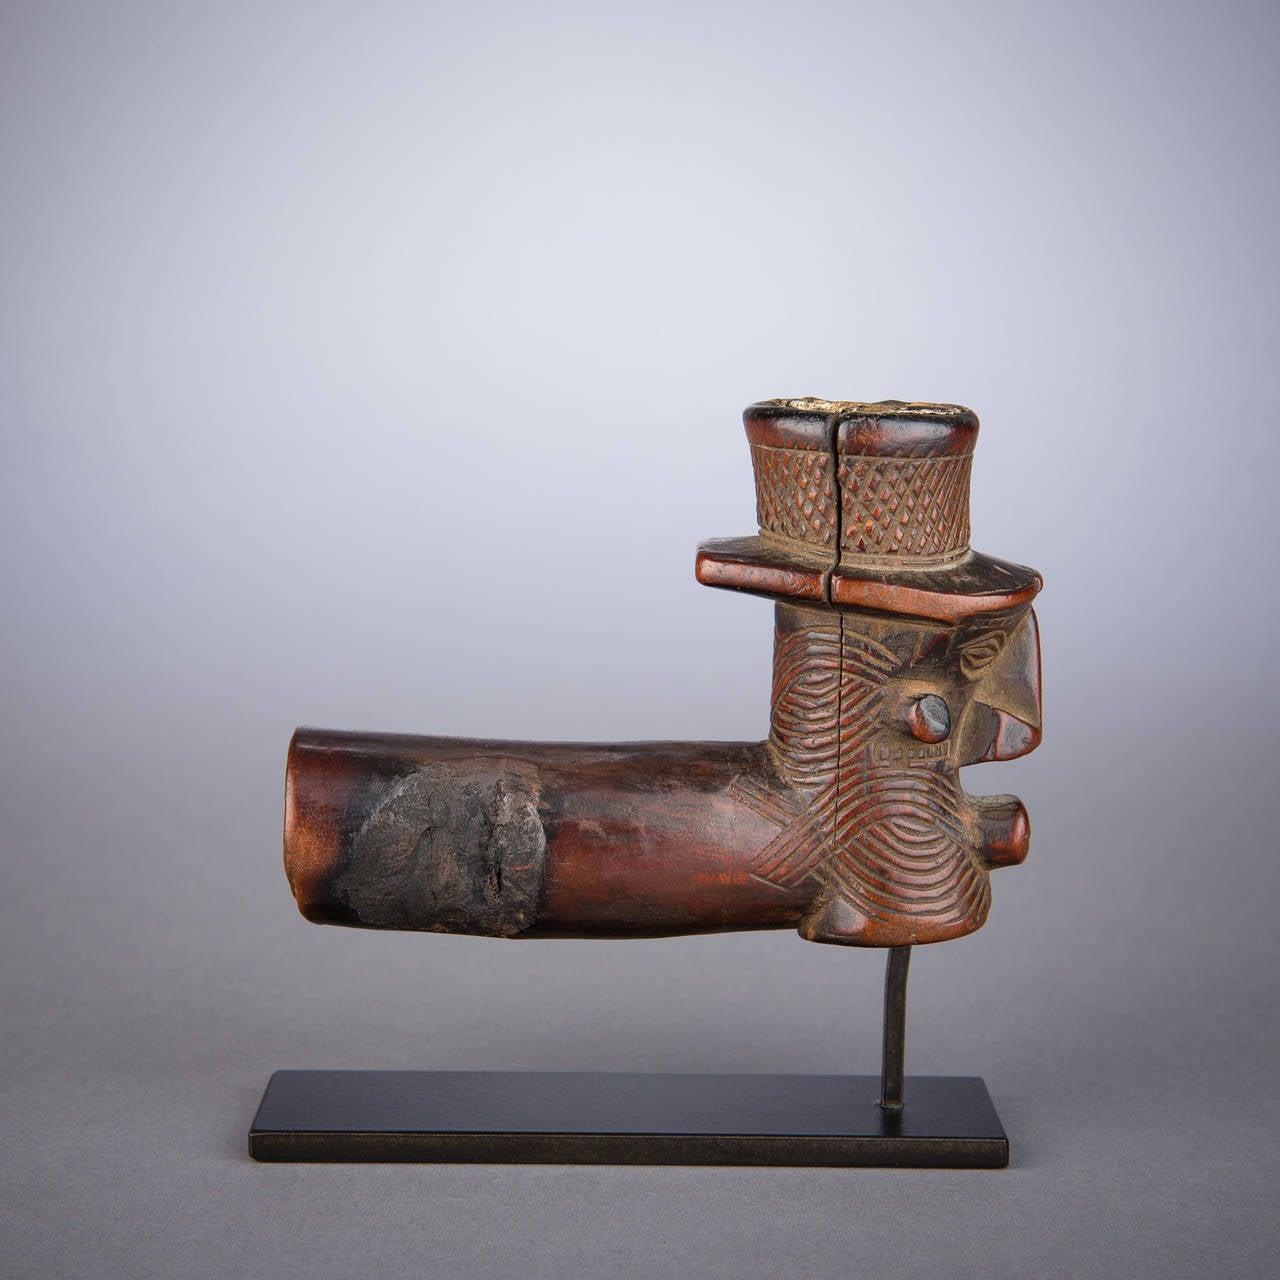 Congolese Early 20th Century Tribal Kuba or Binji Pipe, D.R. Congo For Sale